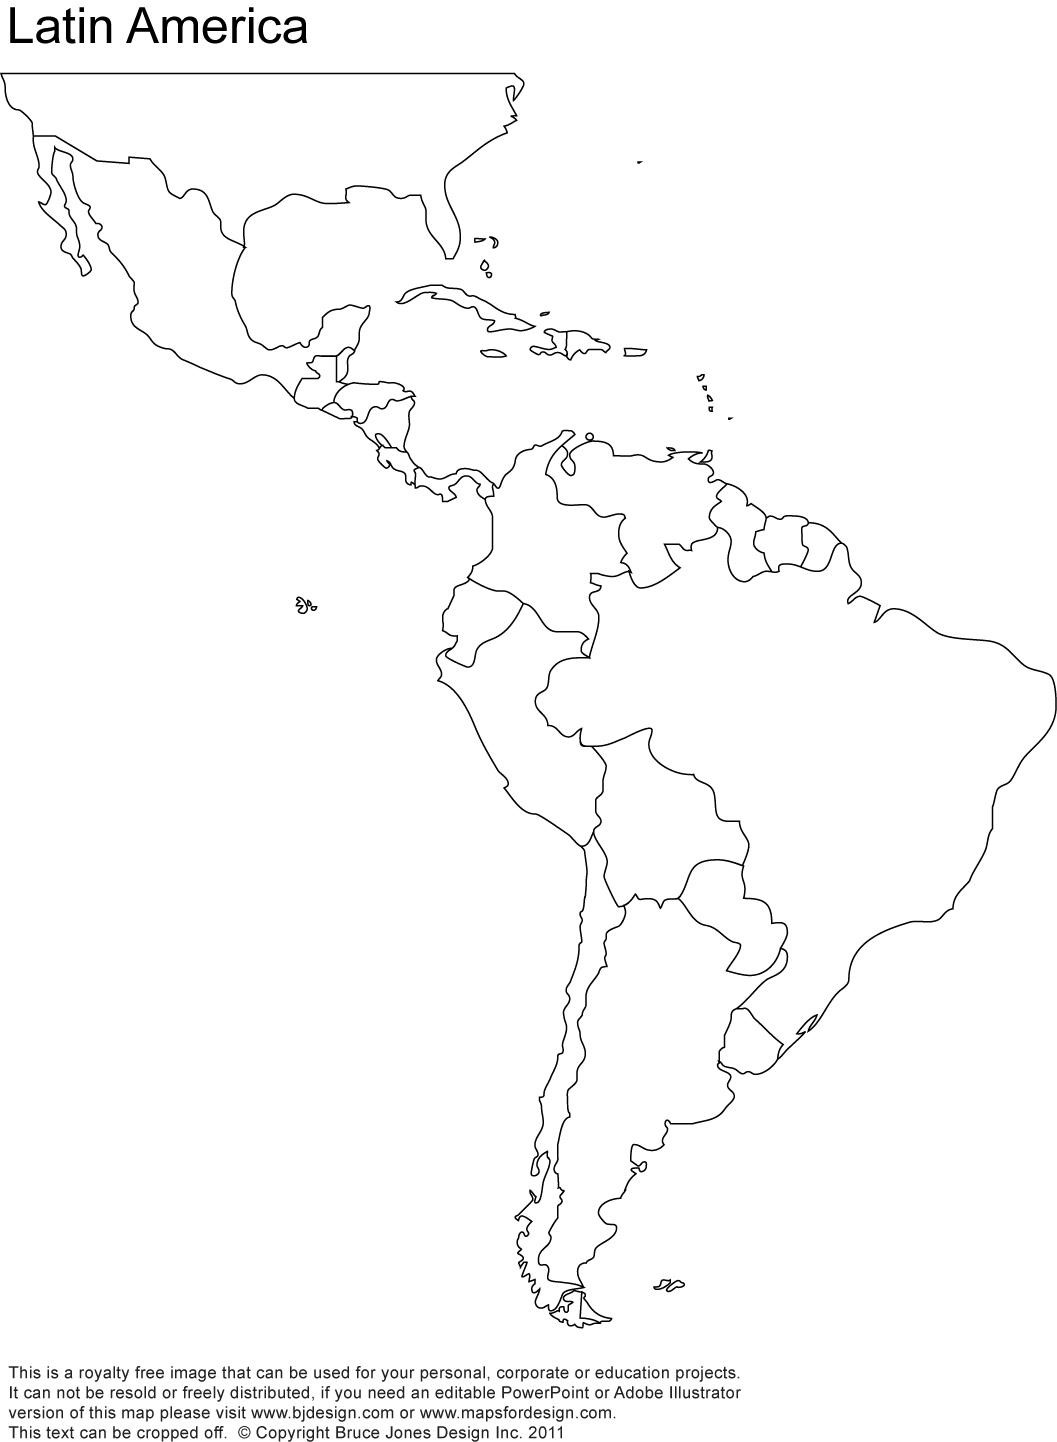 LatinAmericaPrintNoText